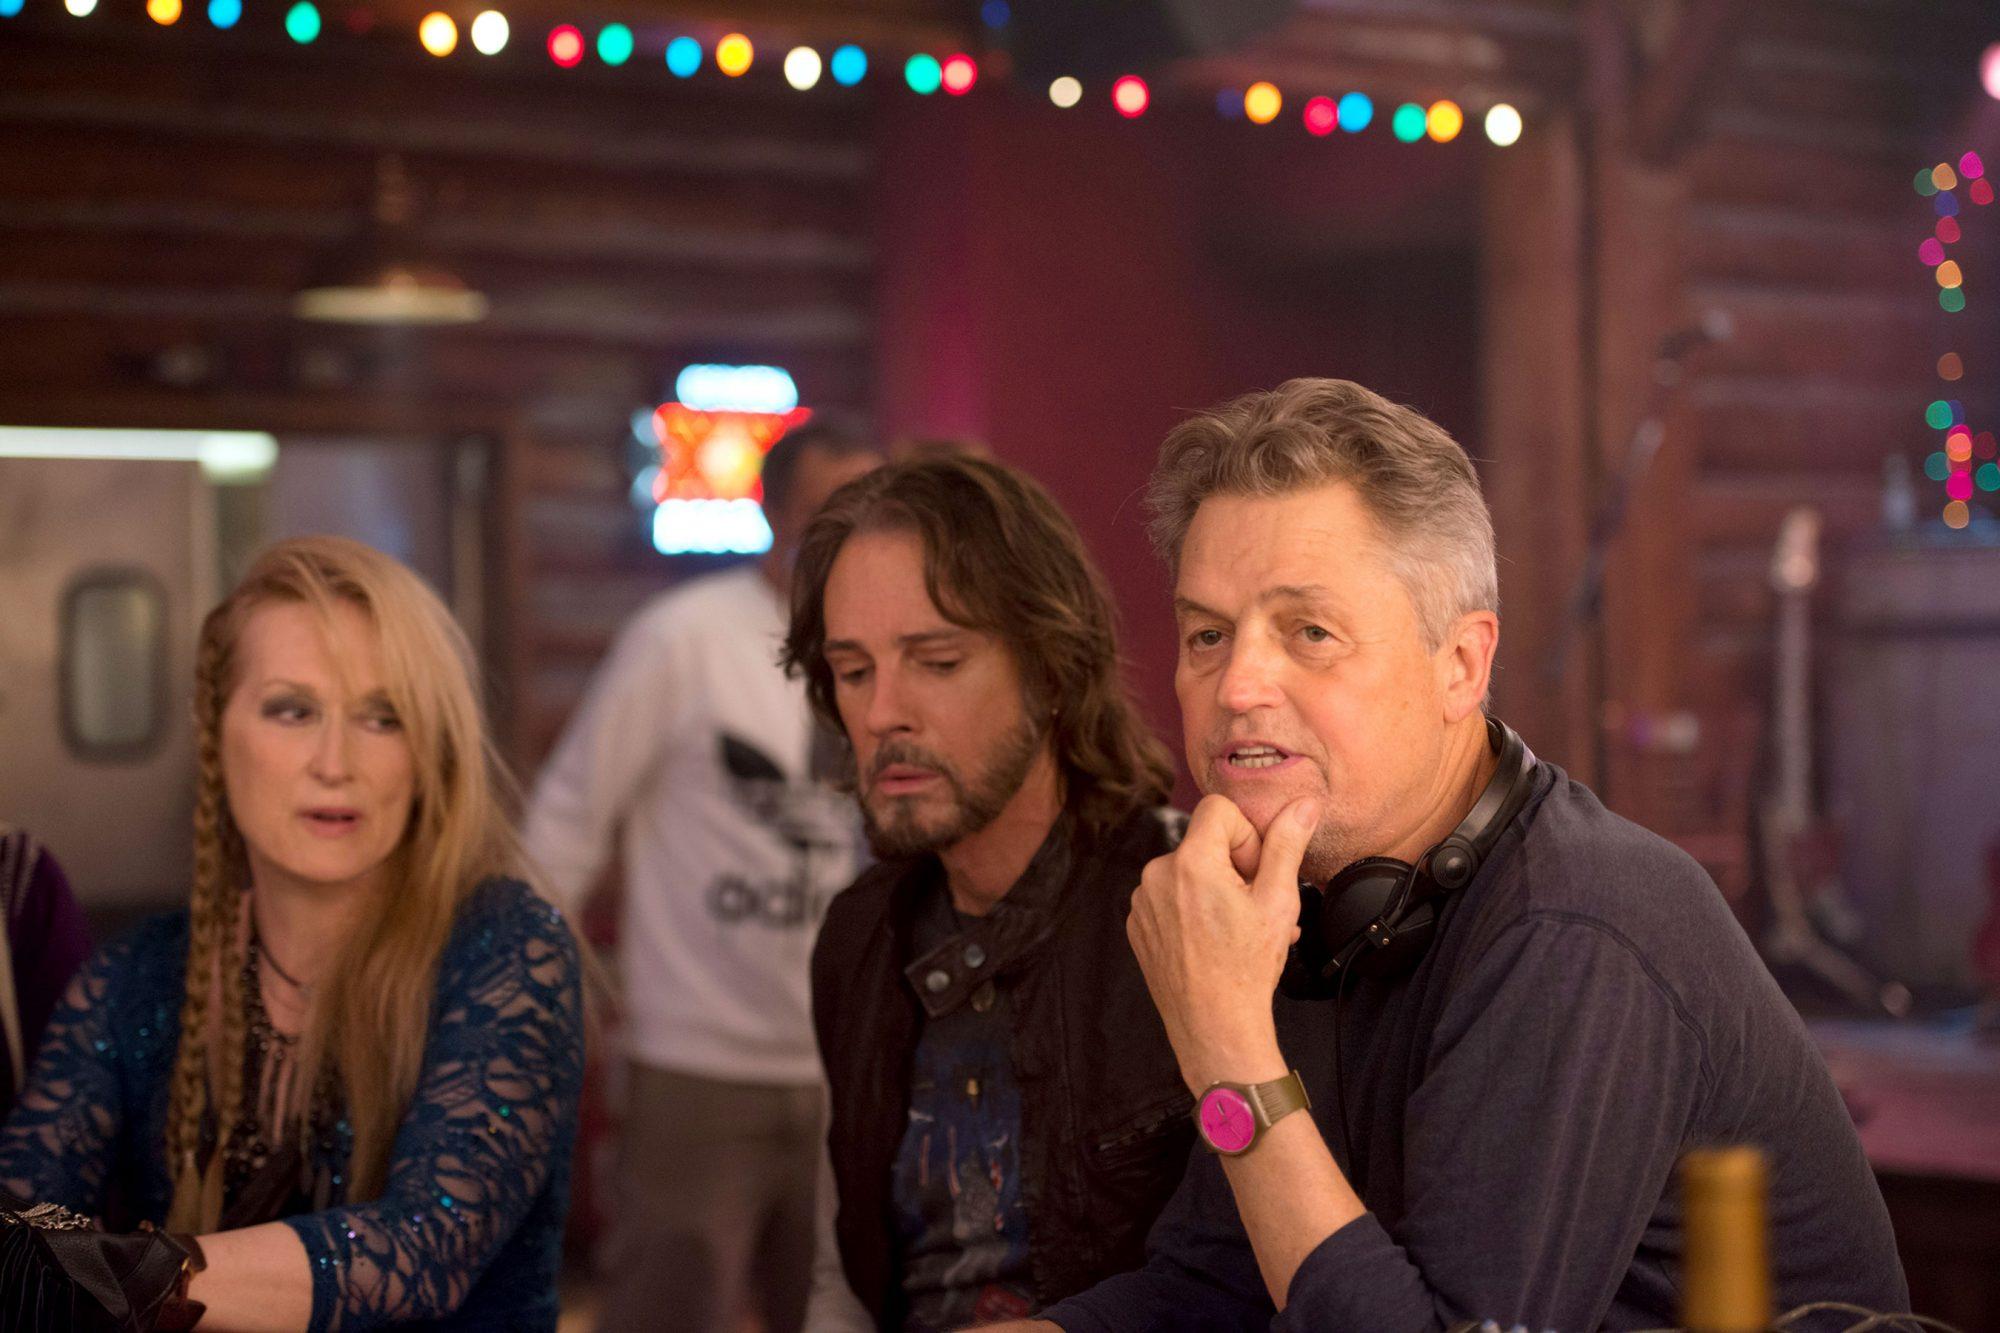 RICKI AND THE FLASH, l-r: Meryl Streep, Rick Springfield, director Jonathen Demme on set, 2015. ph: